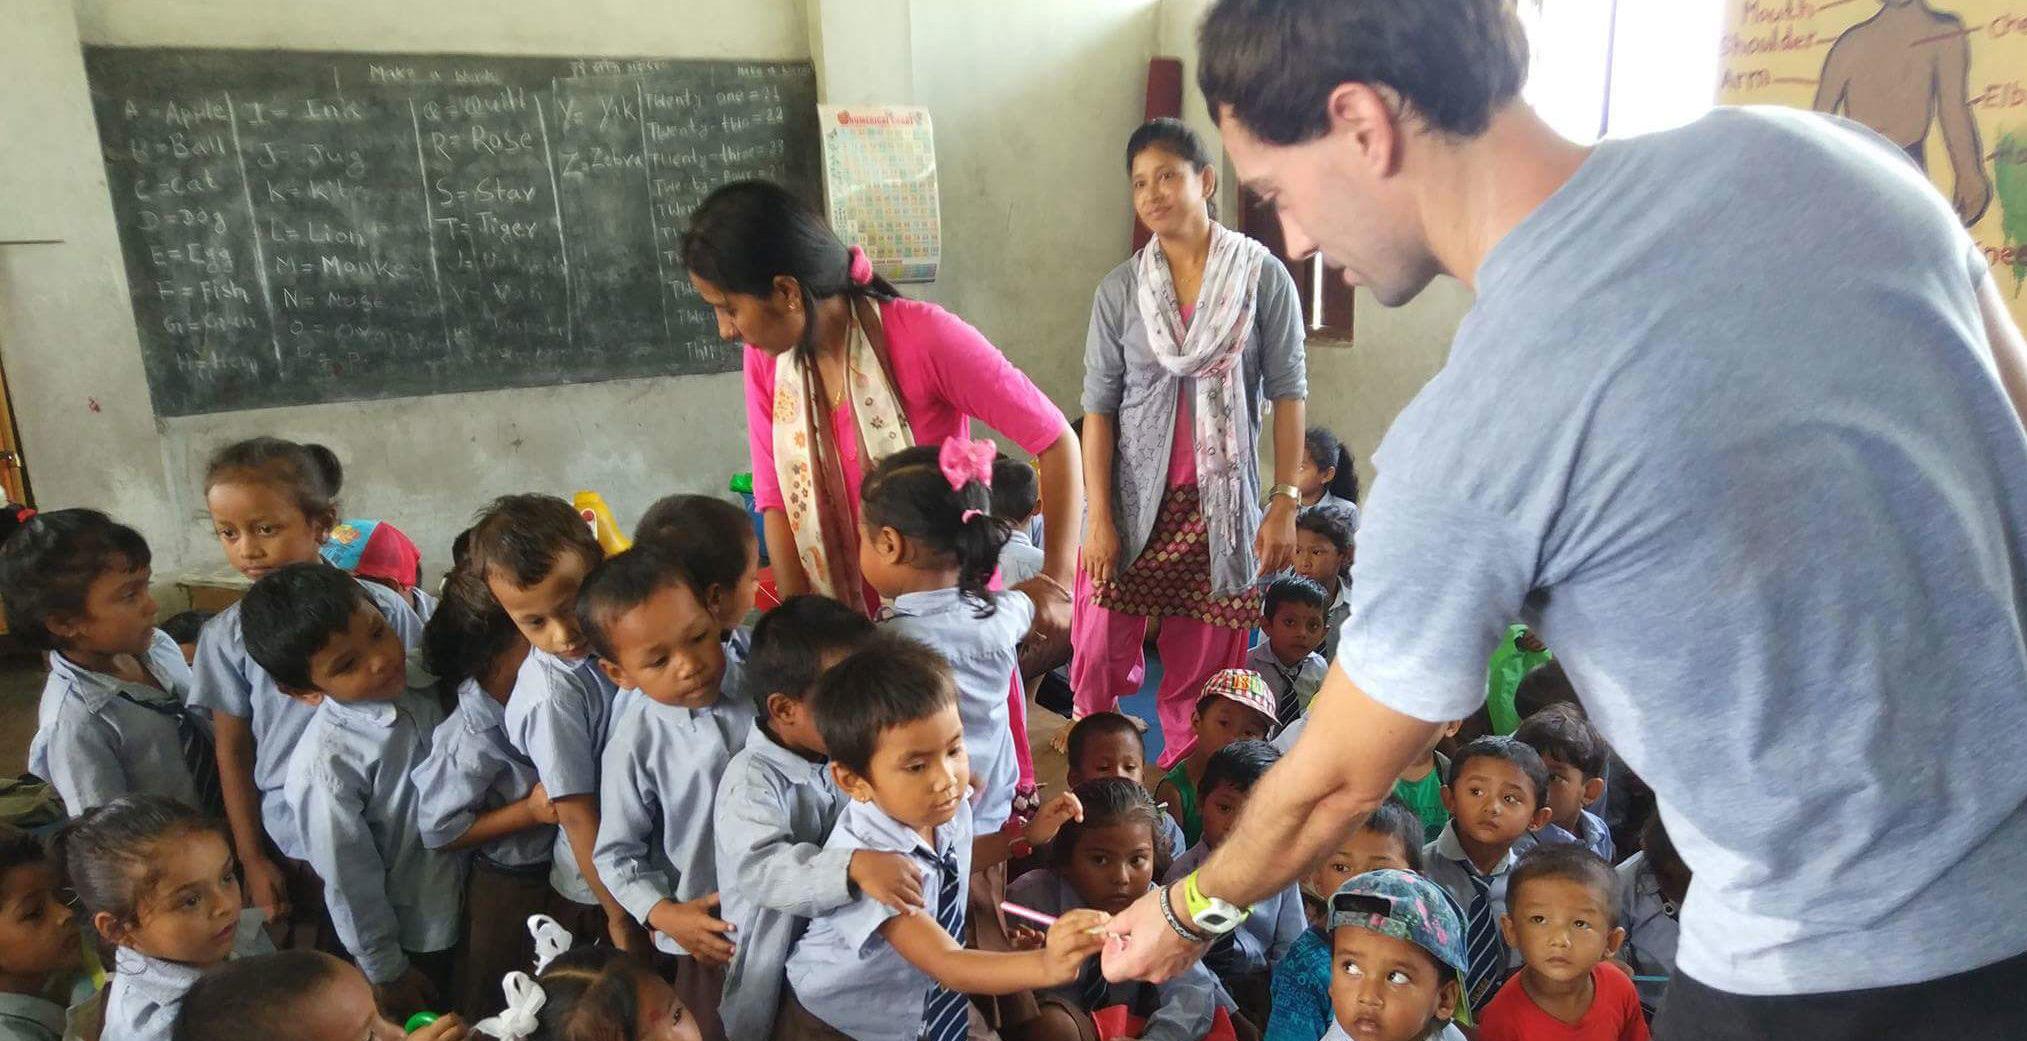 give-back-teach-abroad-workaway-skills-travel-cv